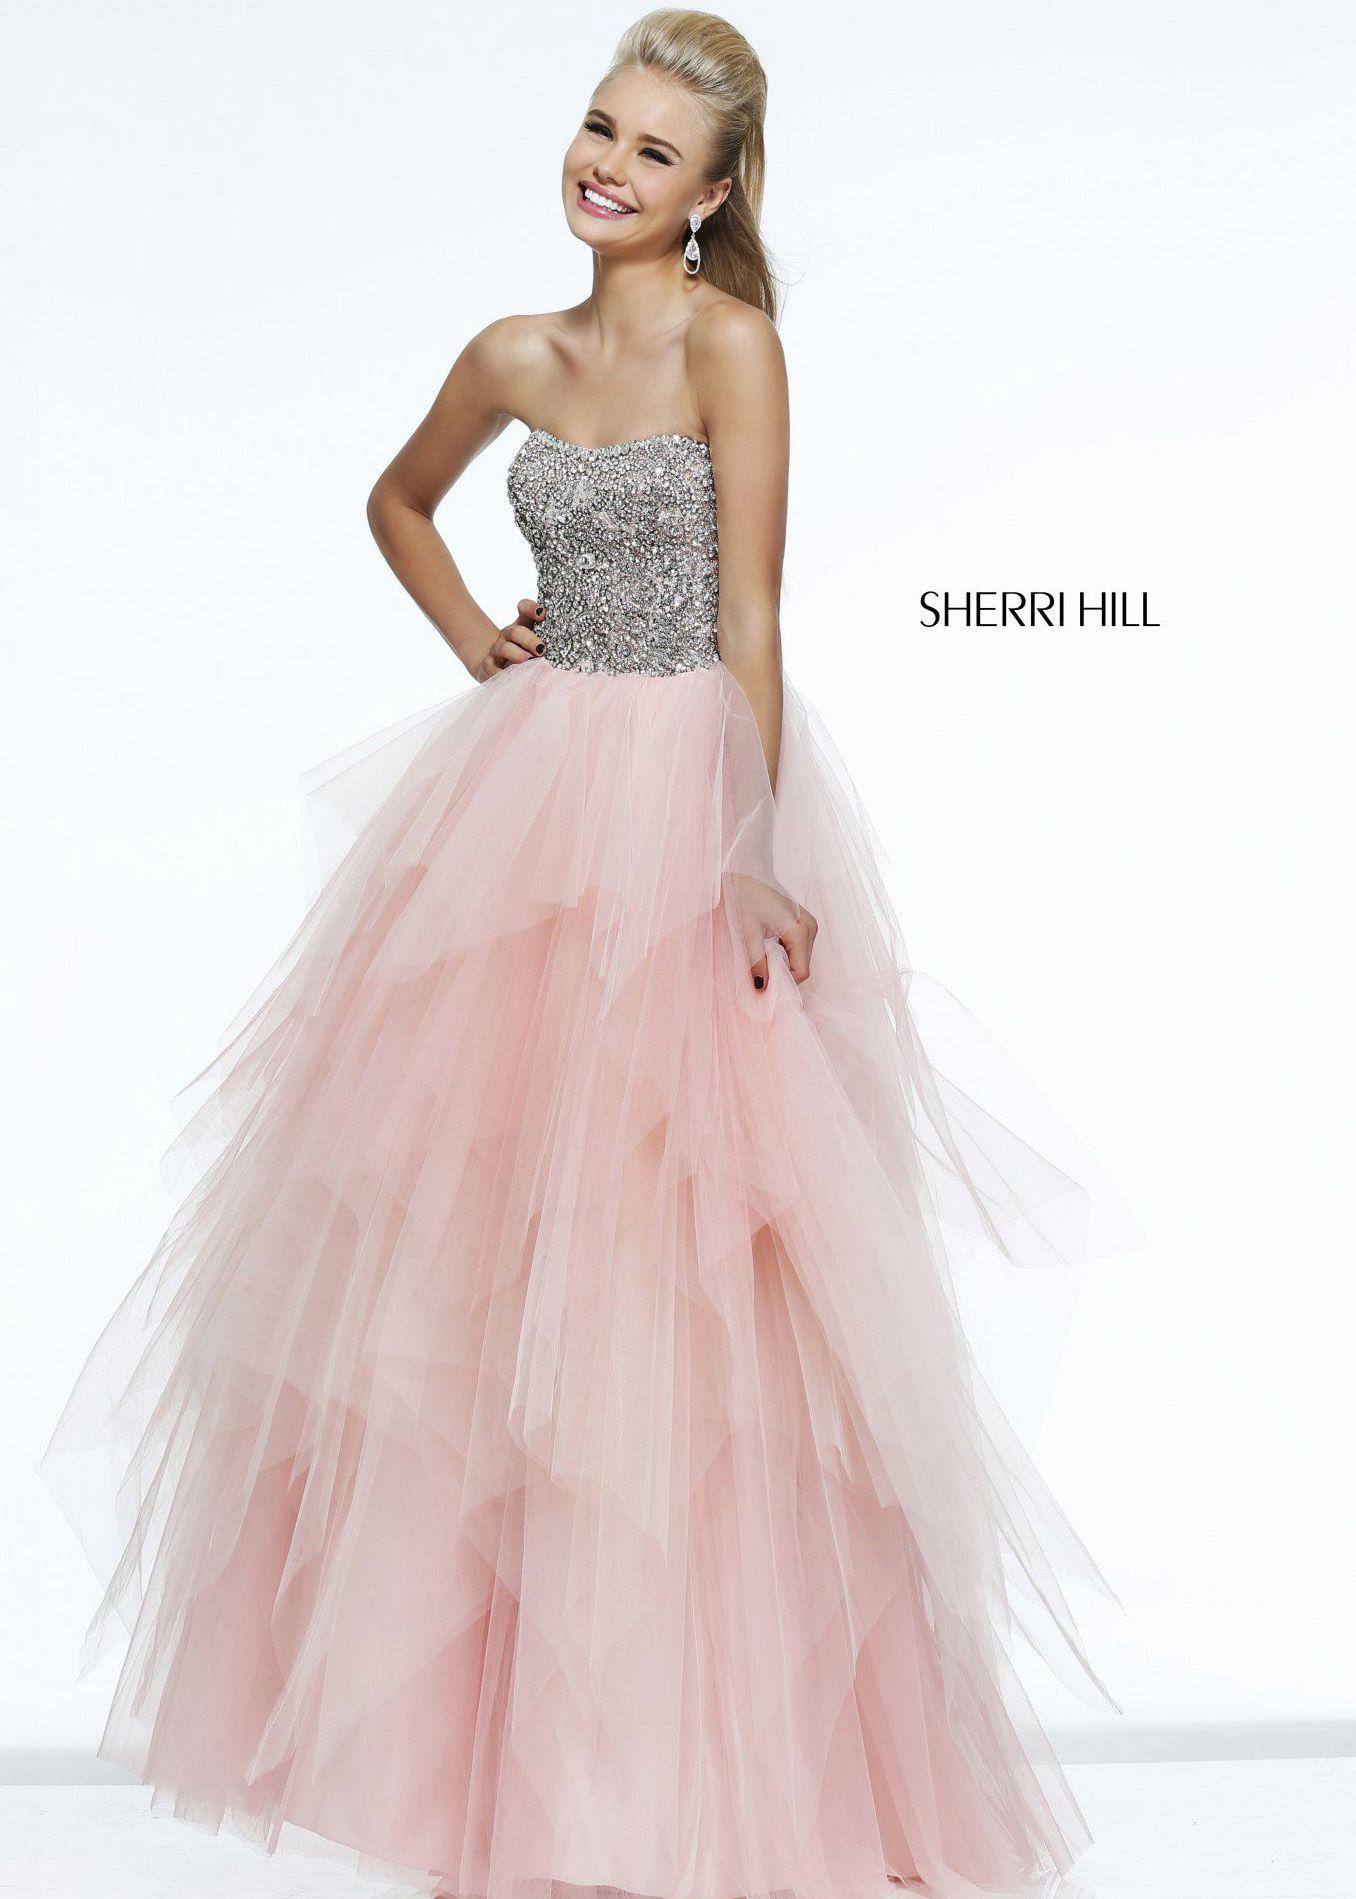 e1a60ef9df6c5 Sherri Hill 11085 - Blush Strapless Beaded Ball Gown Prom Dresses Online